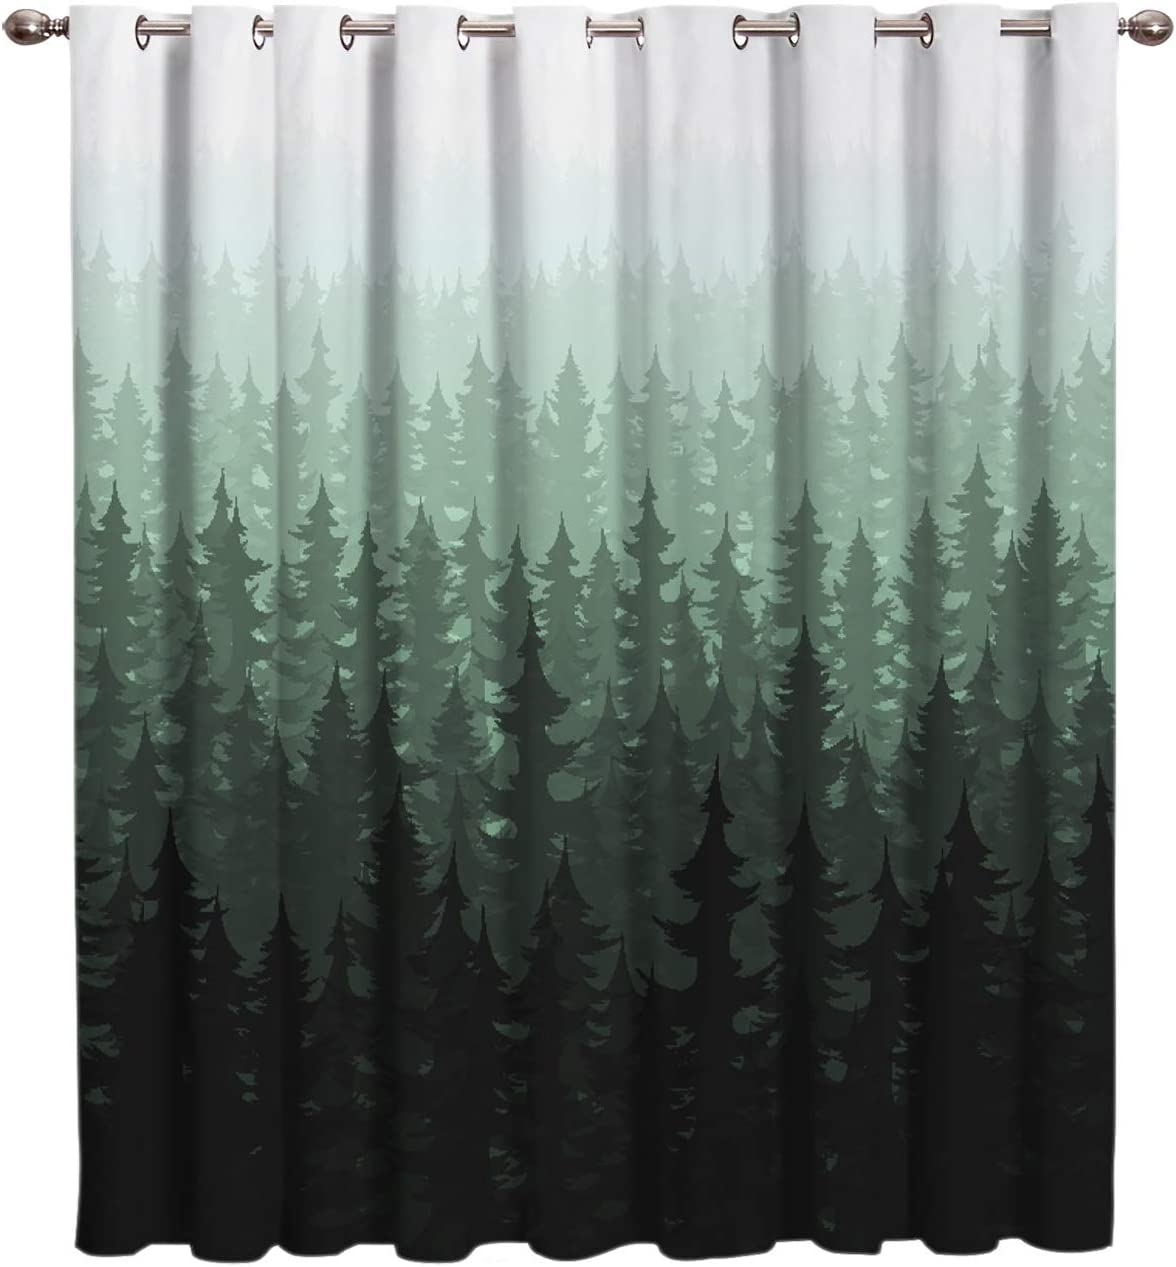 Nature Rare Forest Landscape Same day shipping Decor Window Ki Drapes Treatment Curtain